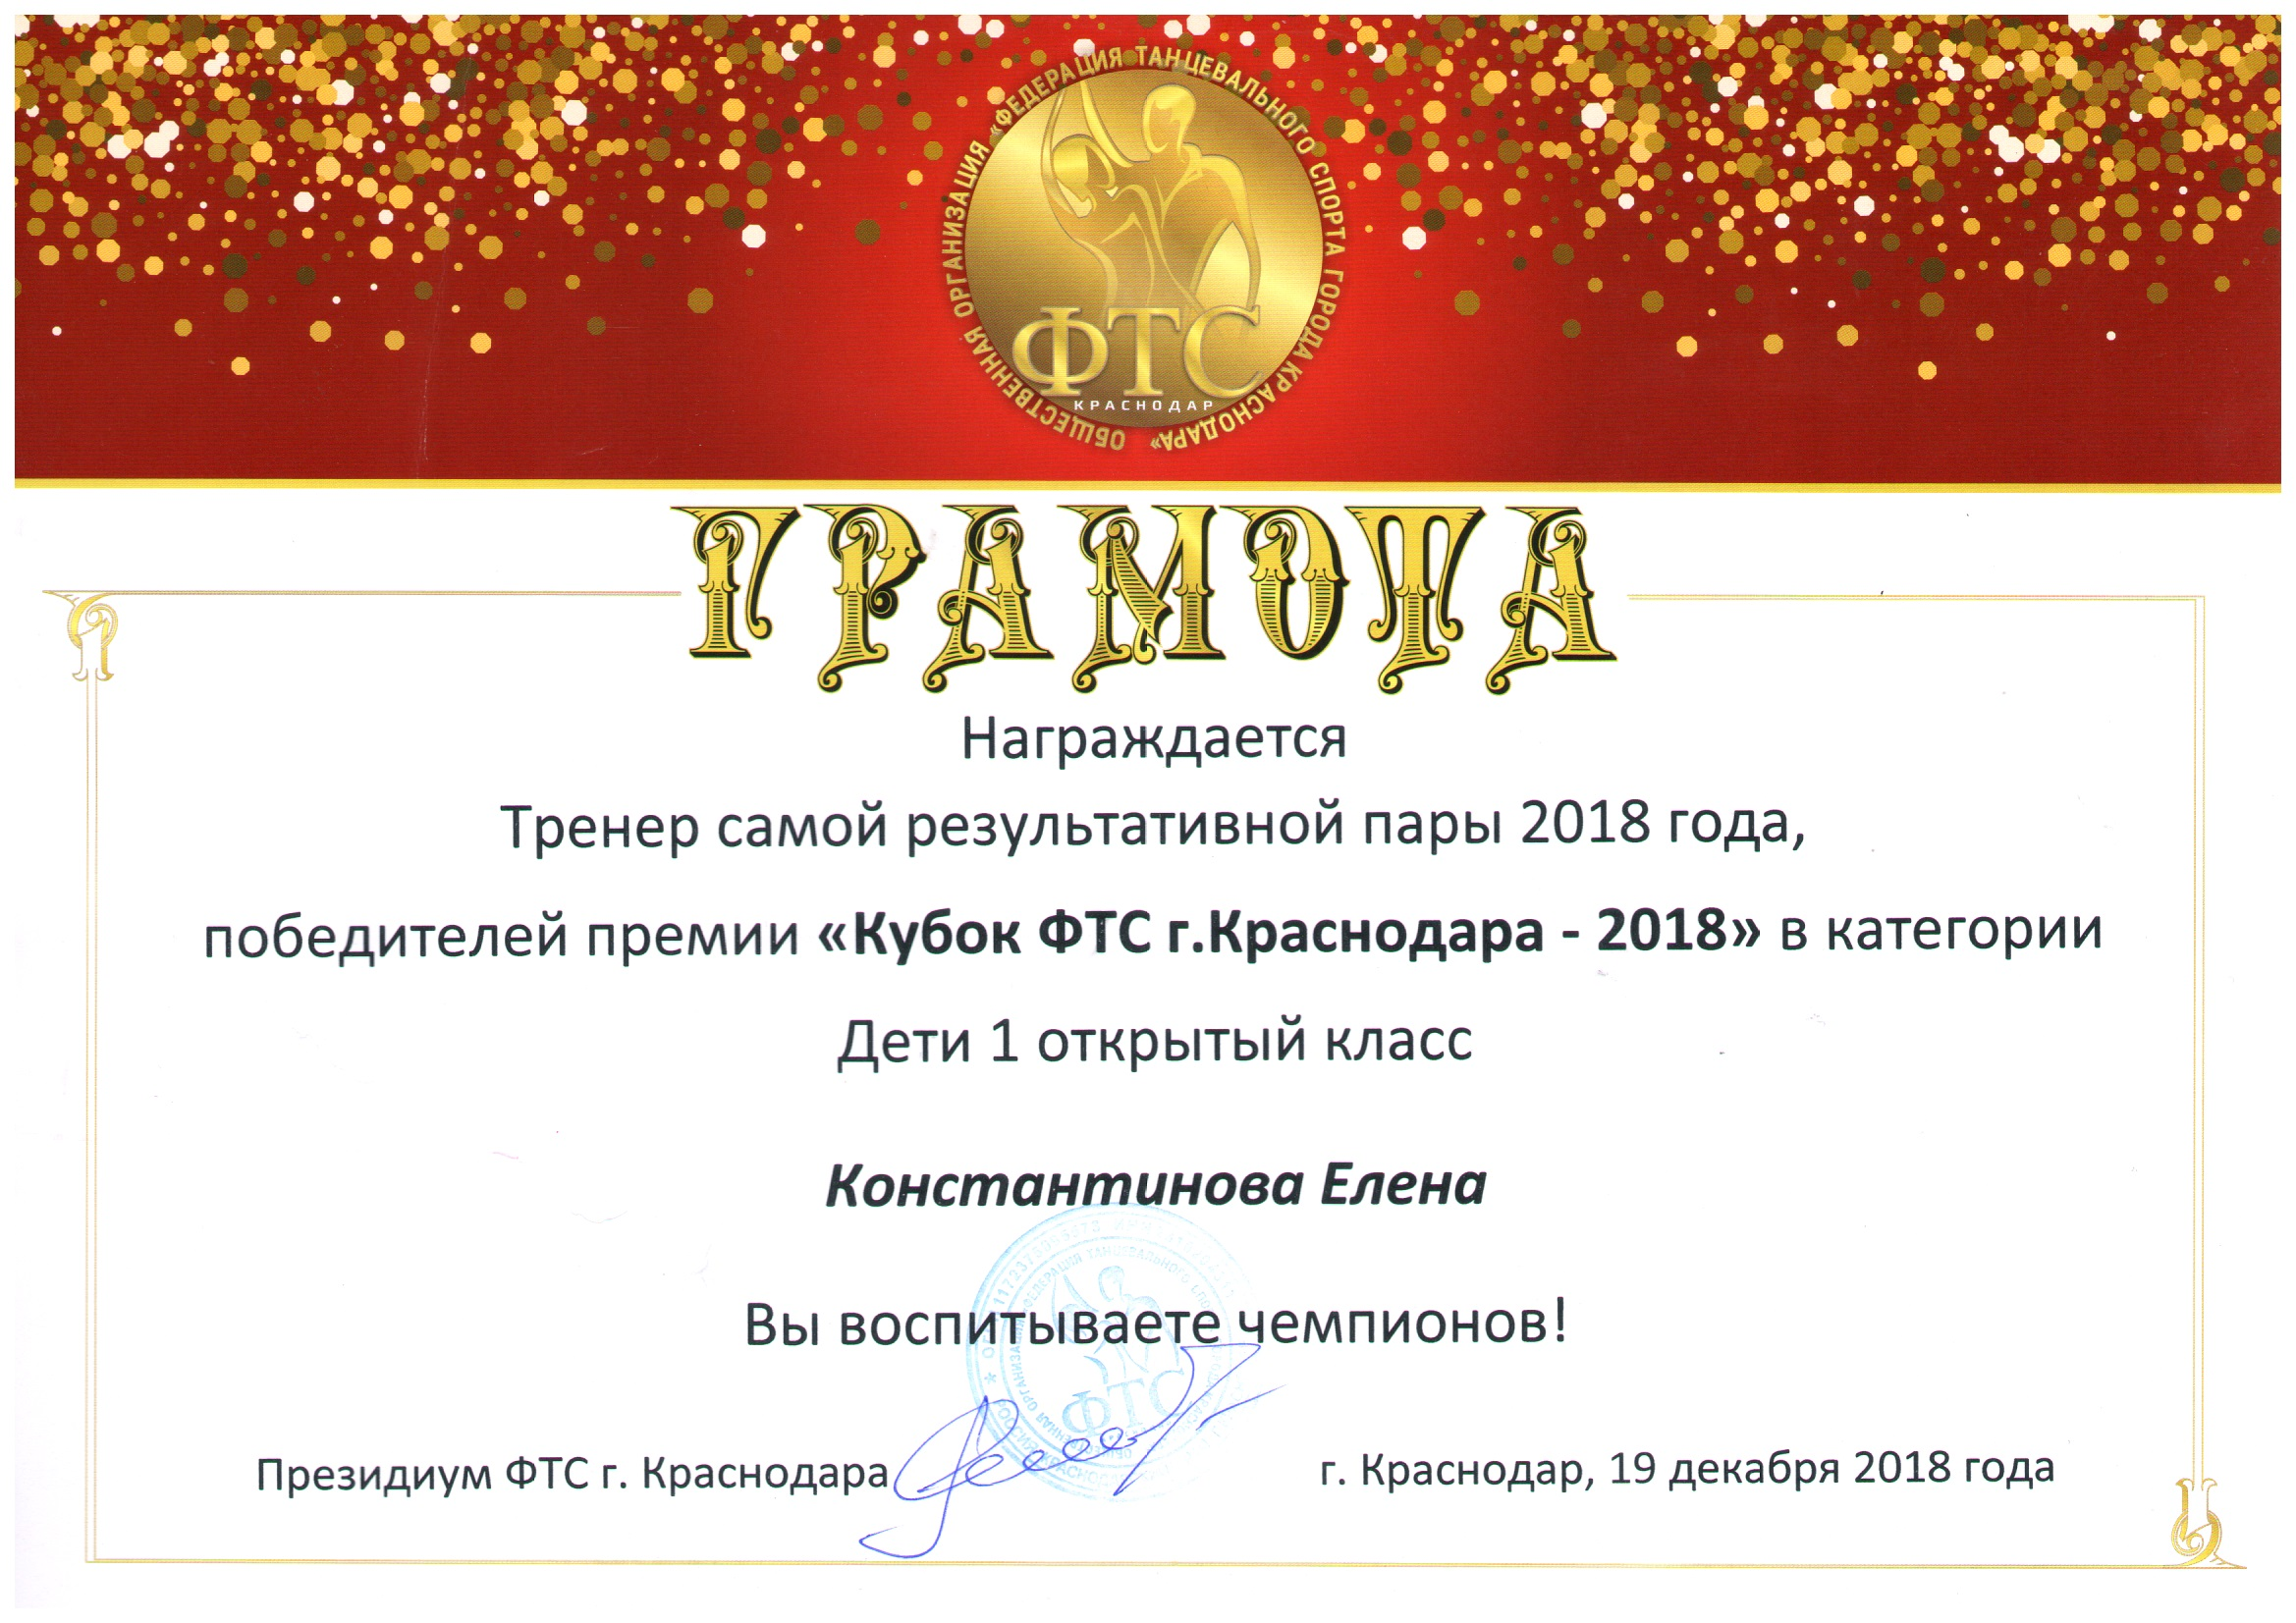 sertificate_15